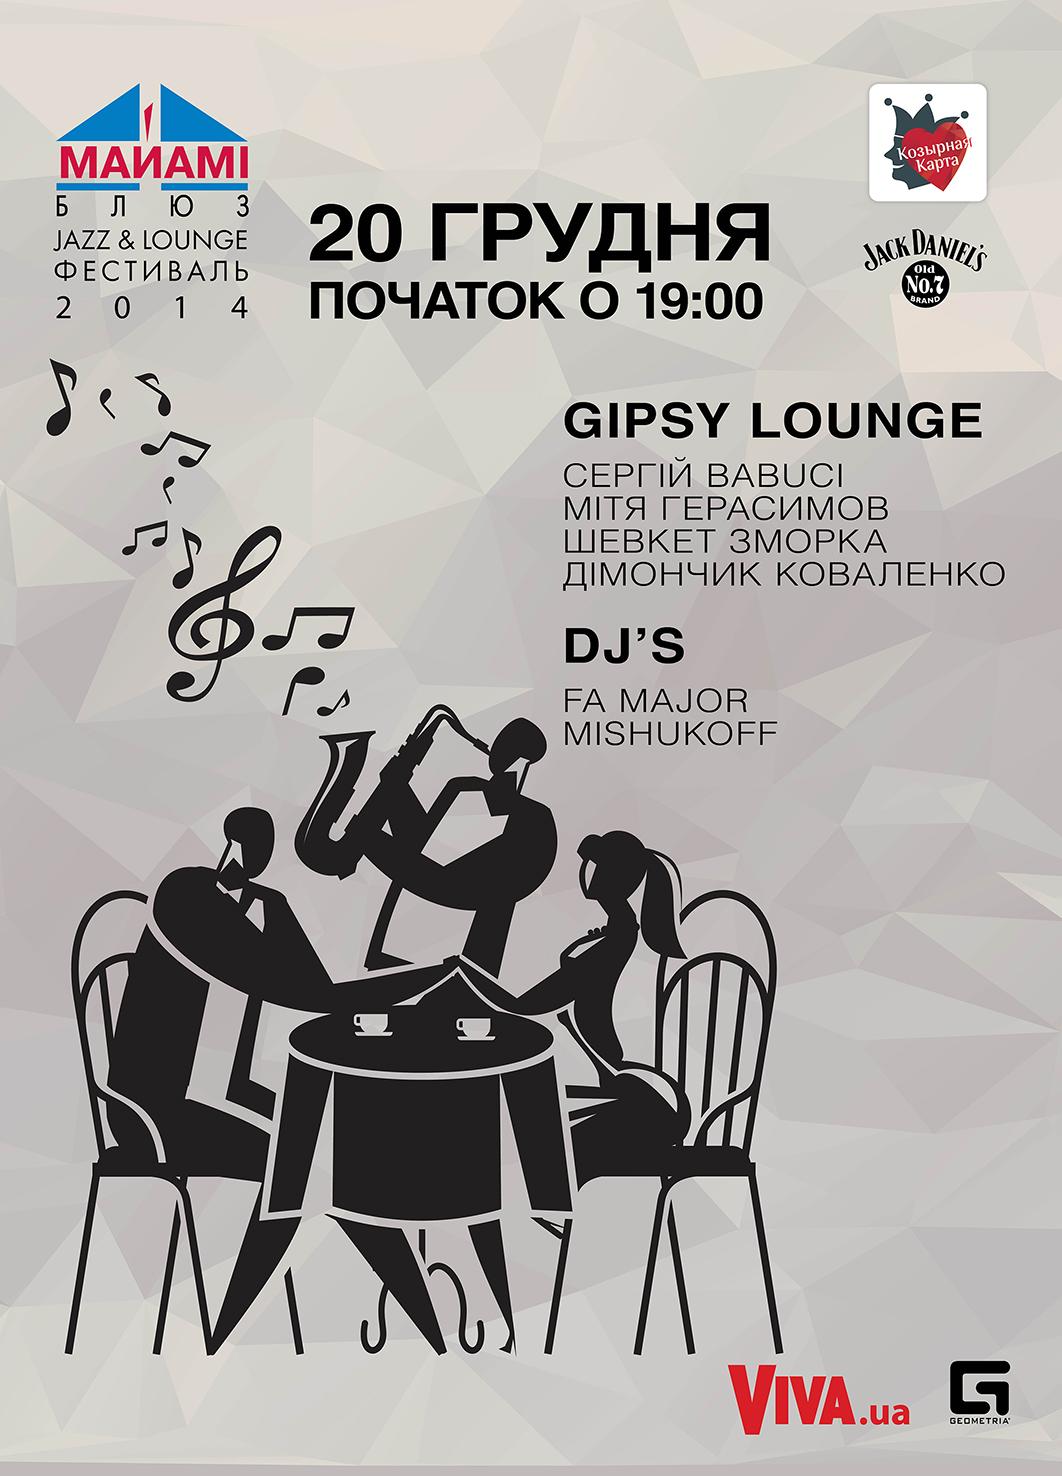 Вечер в стиле gipsy на фестивале Jazz & Lounge Festival 2014